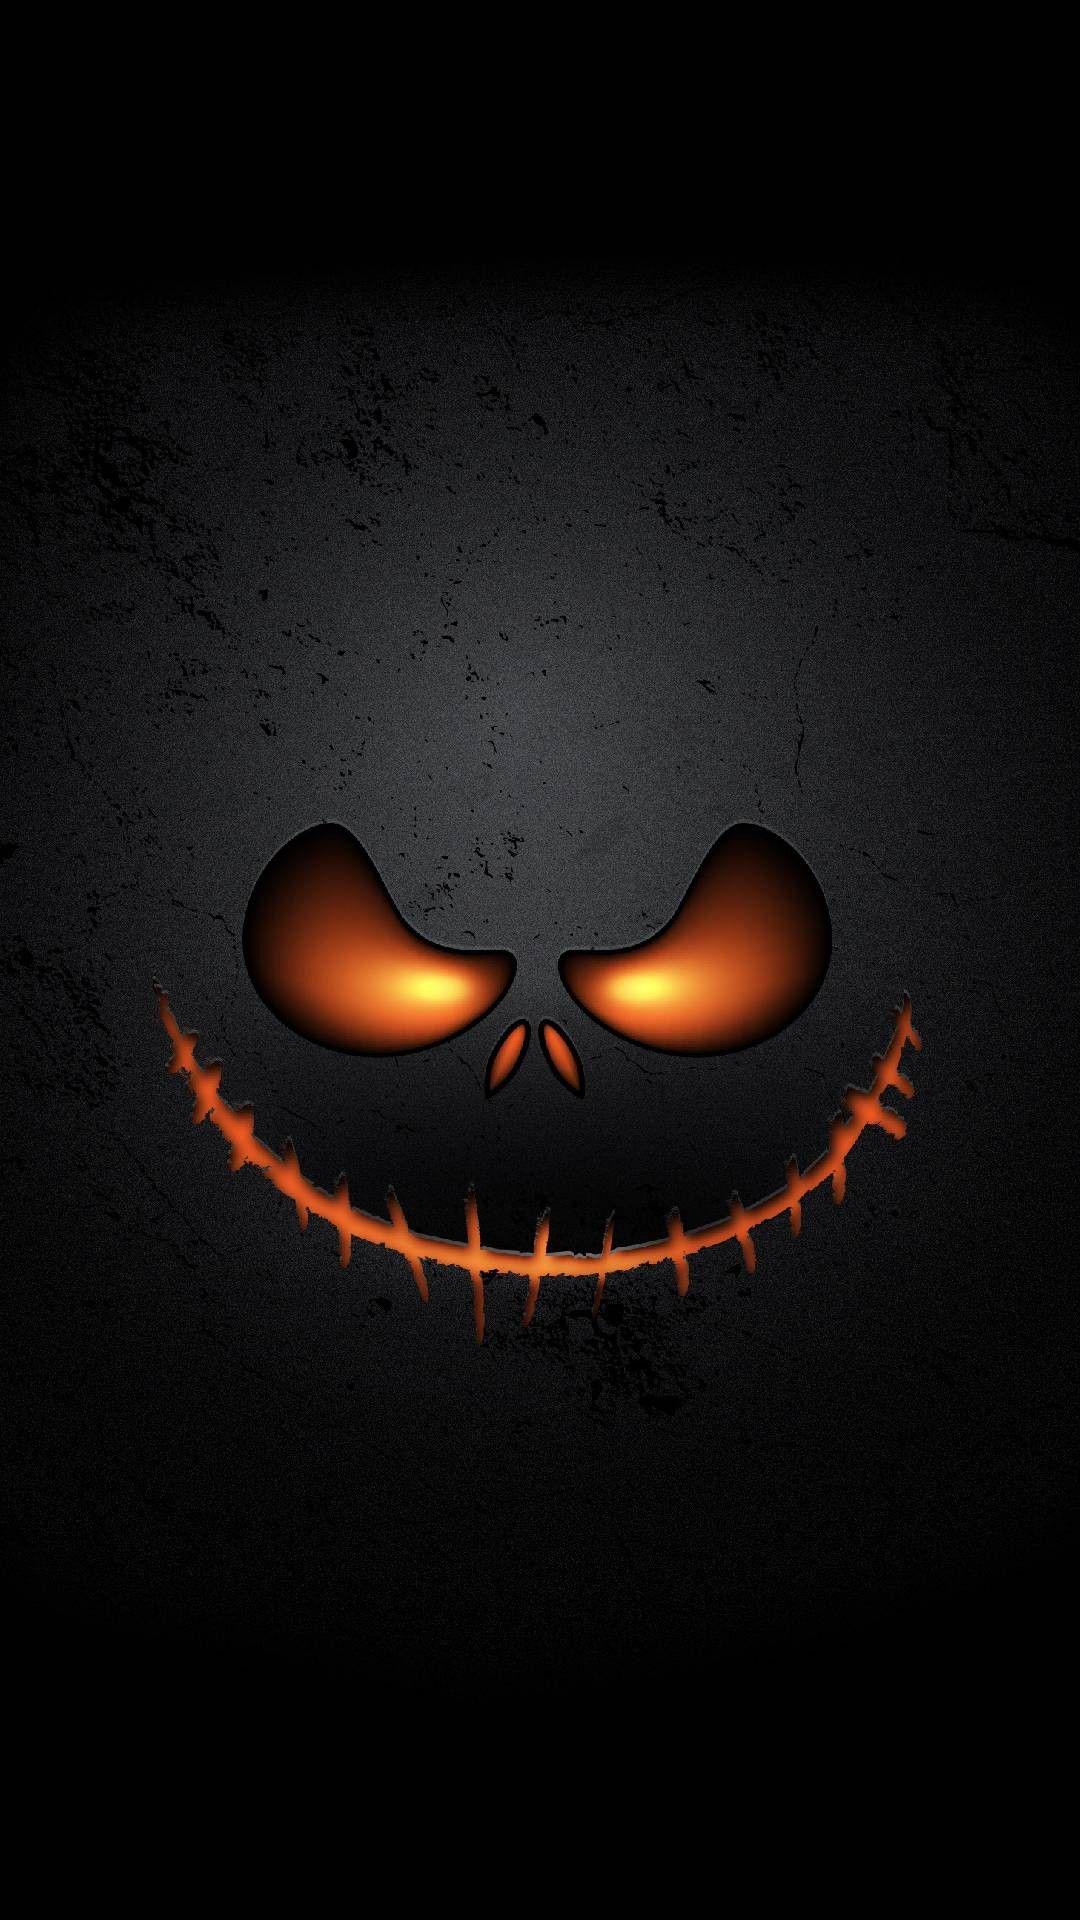 Halloween HD Wallpapers for Google Pixel XL tures